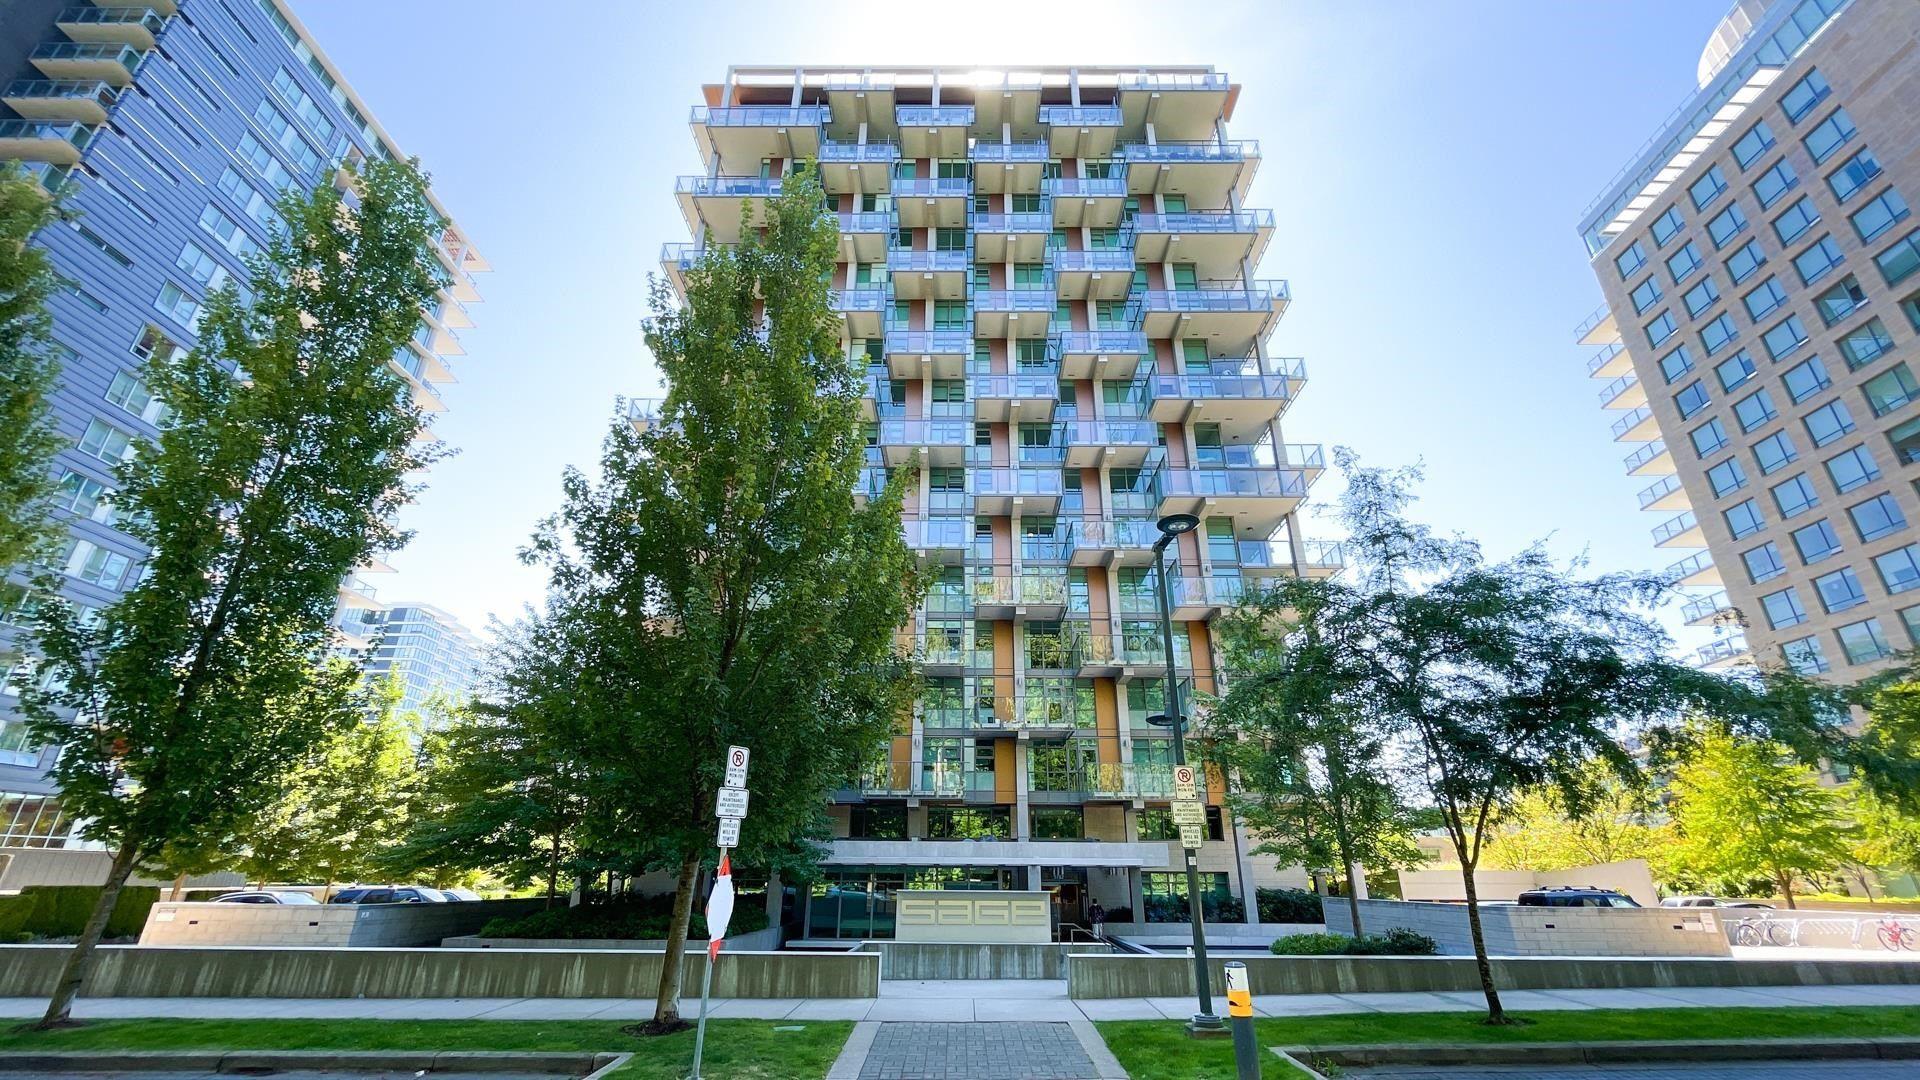 "Main Photo: 1706 5782 BERTON Avenue in Vancouver: University VW Condo for sale in ""Sage"" (Vancouver West)  : MLS®# R2610274"